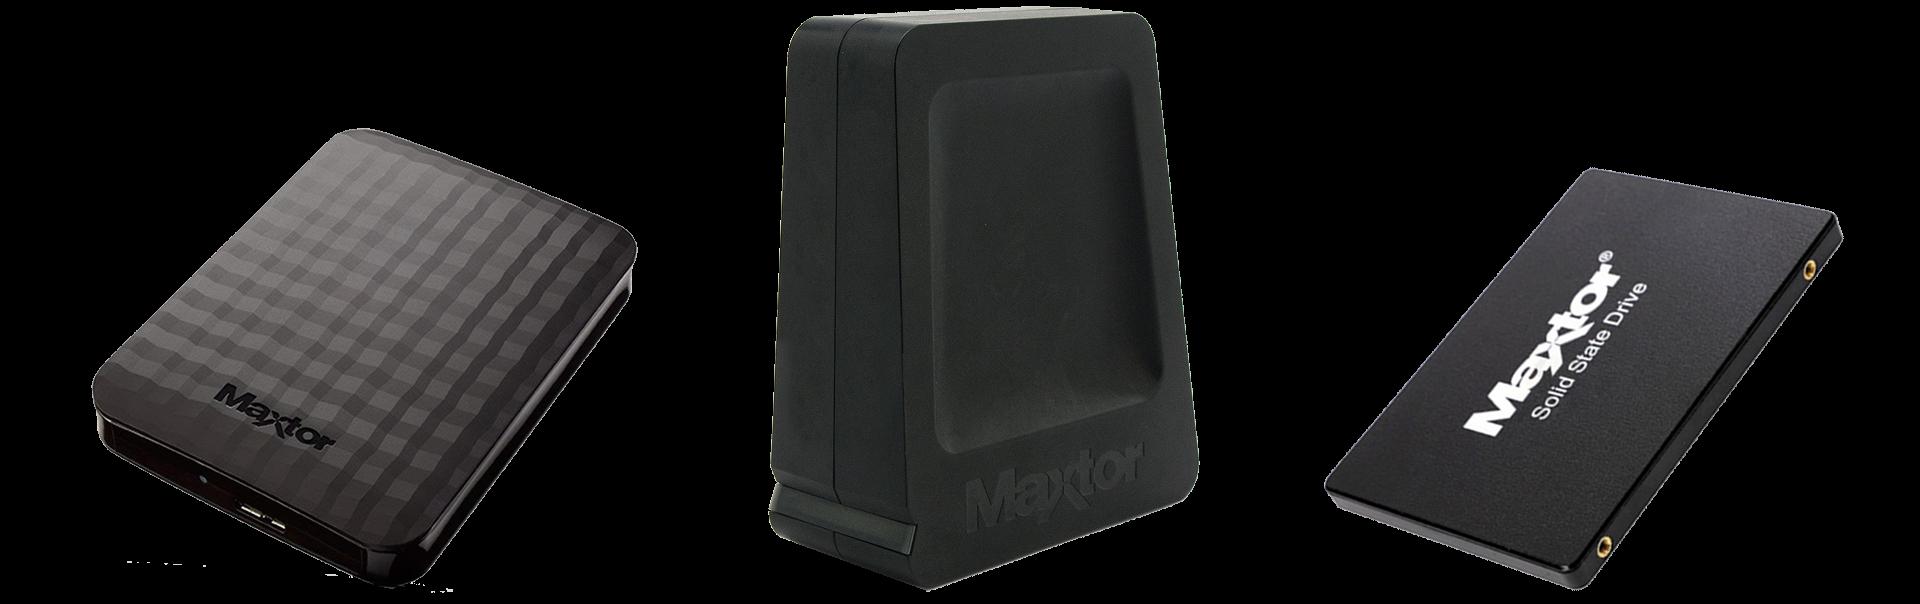 Maxtor Data Recovery